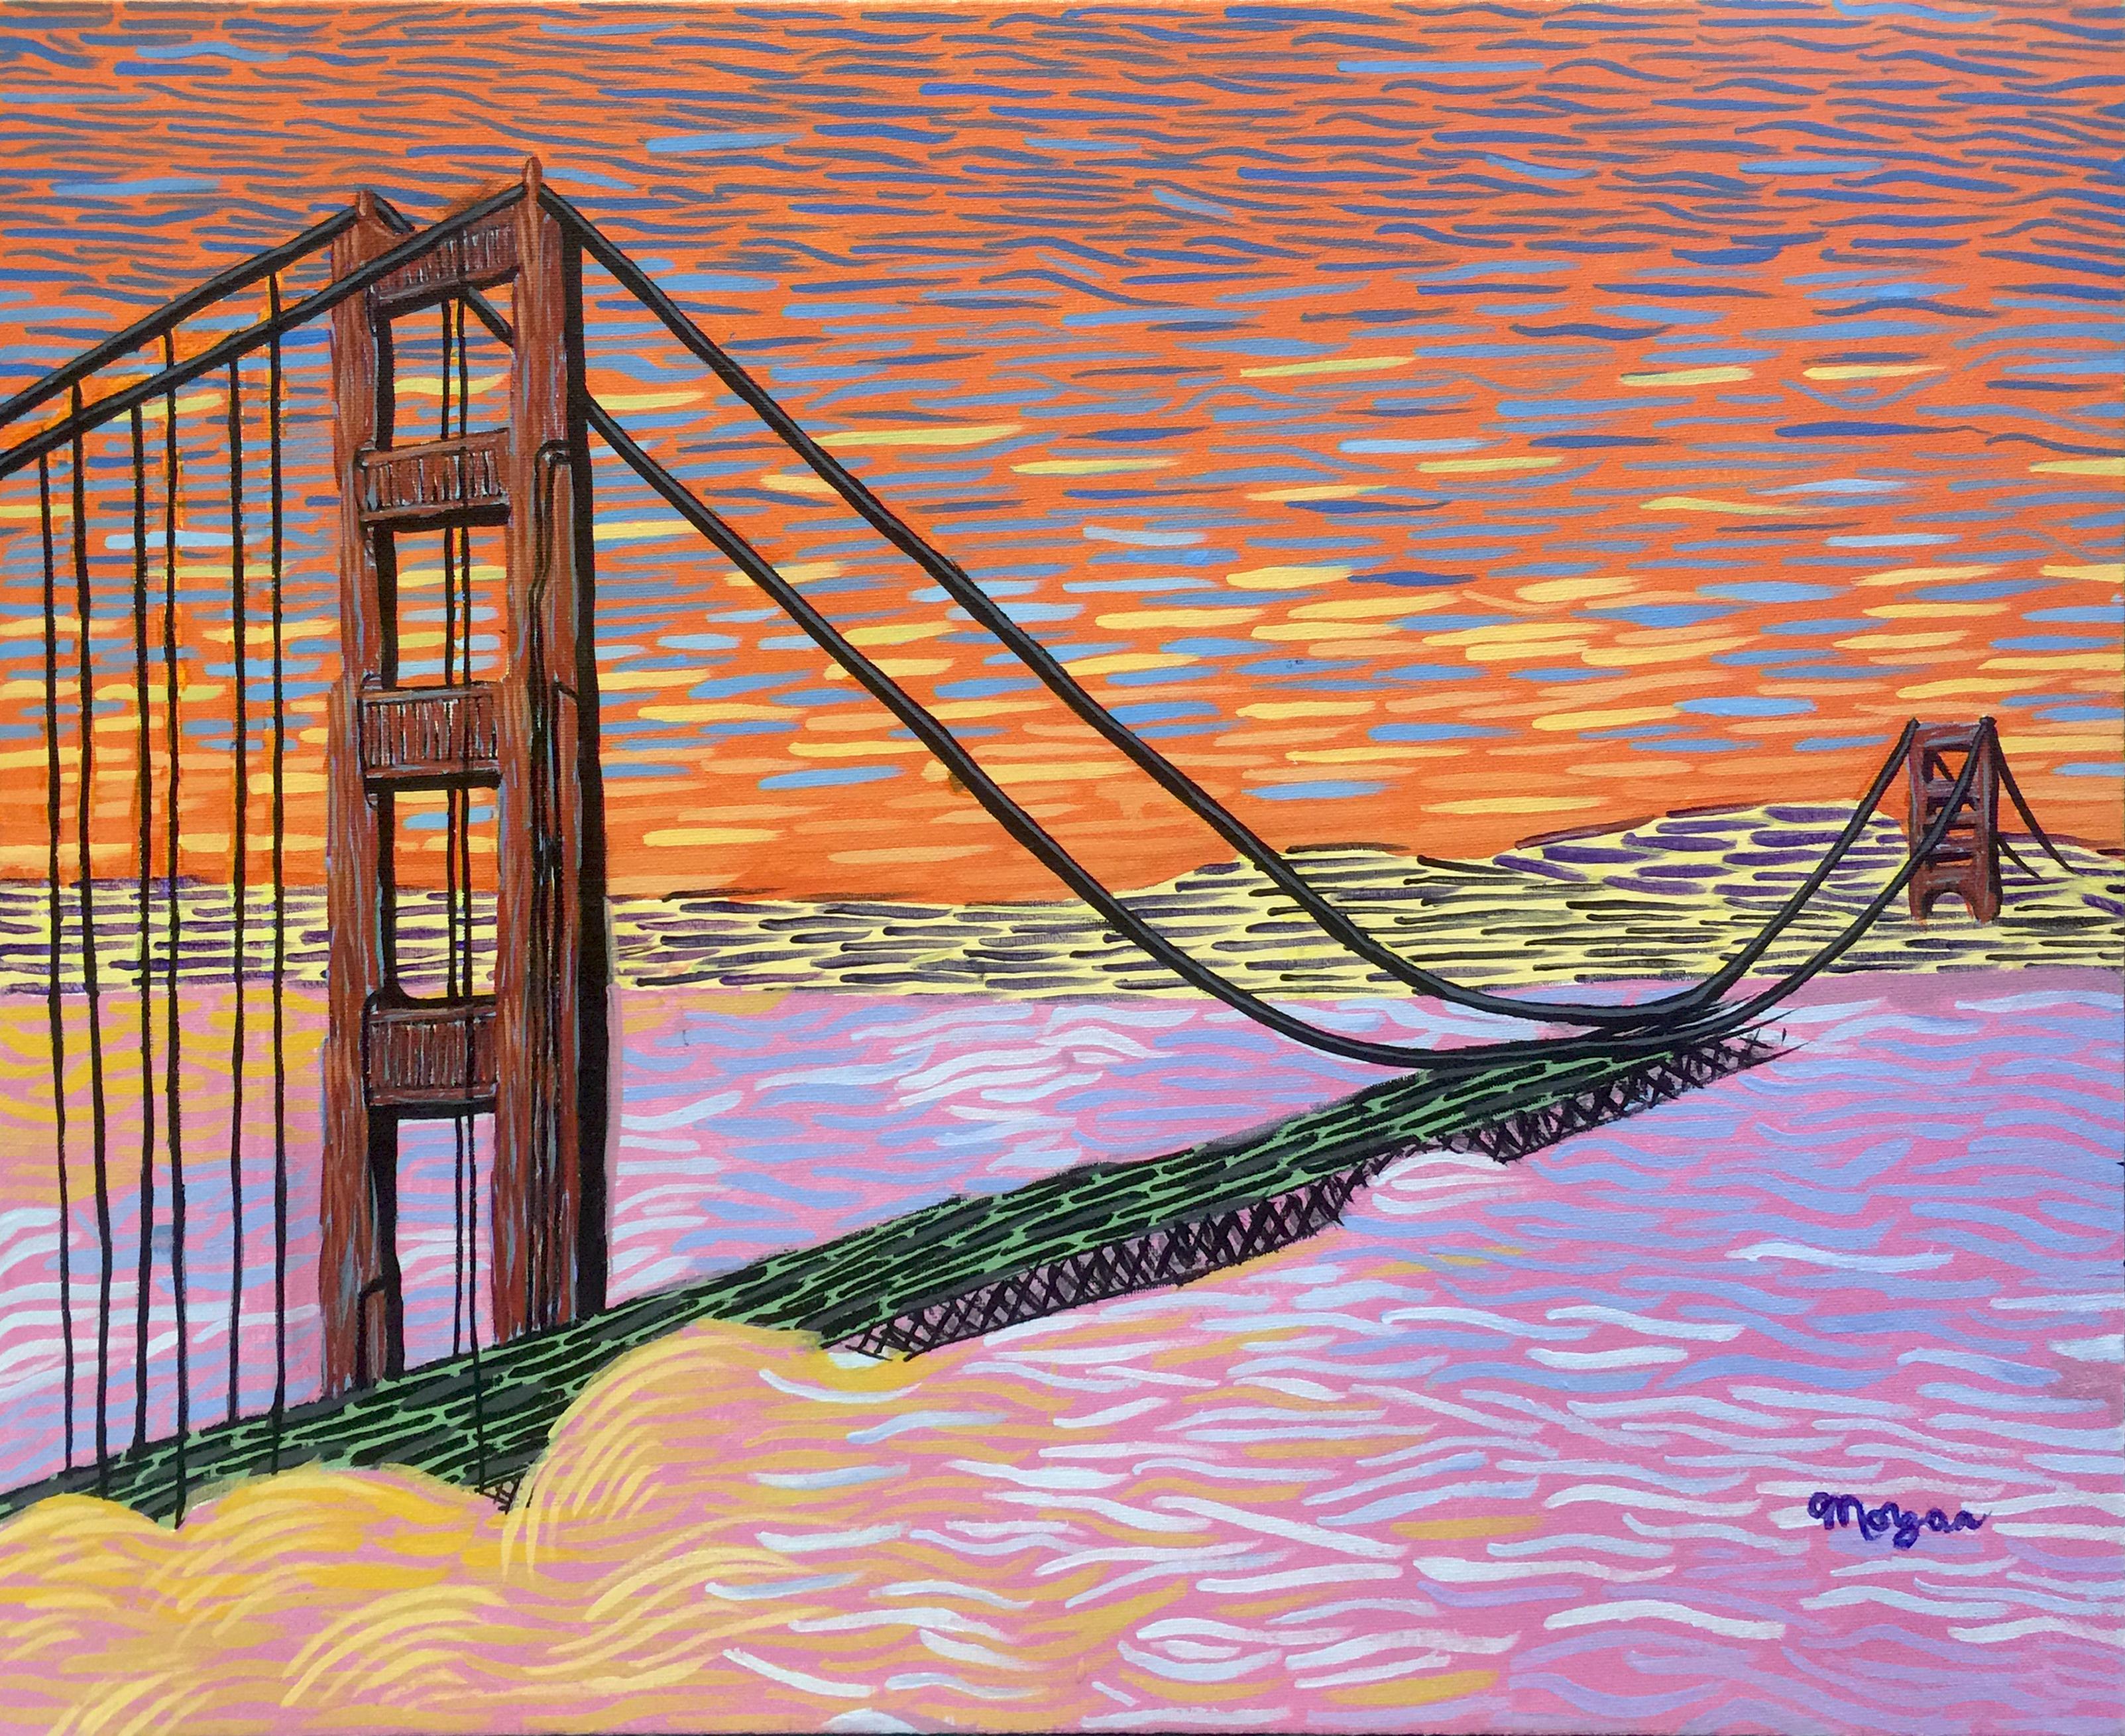 Morgan Lee - Golden Gate Bridge